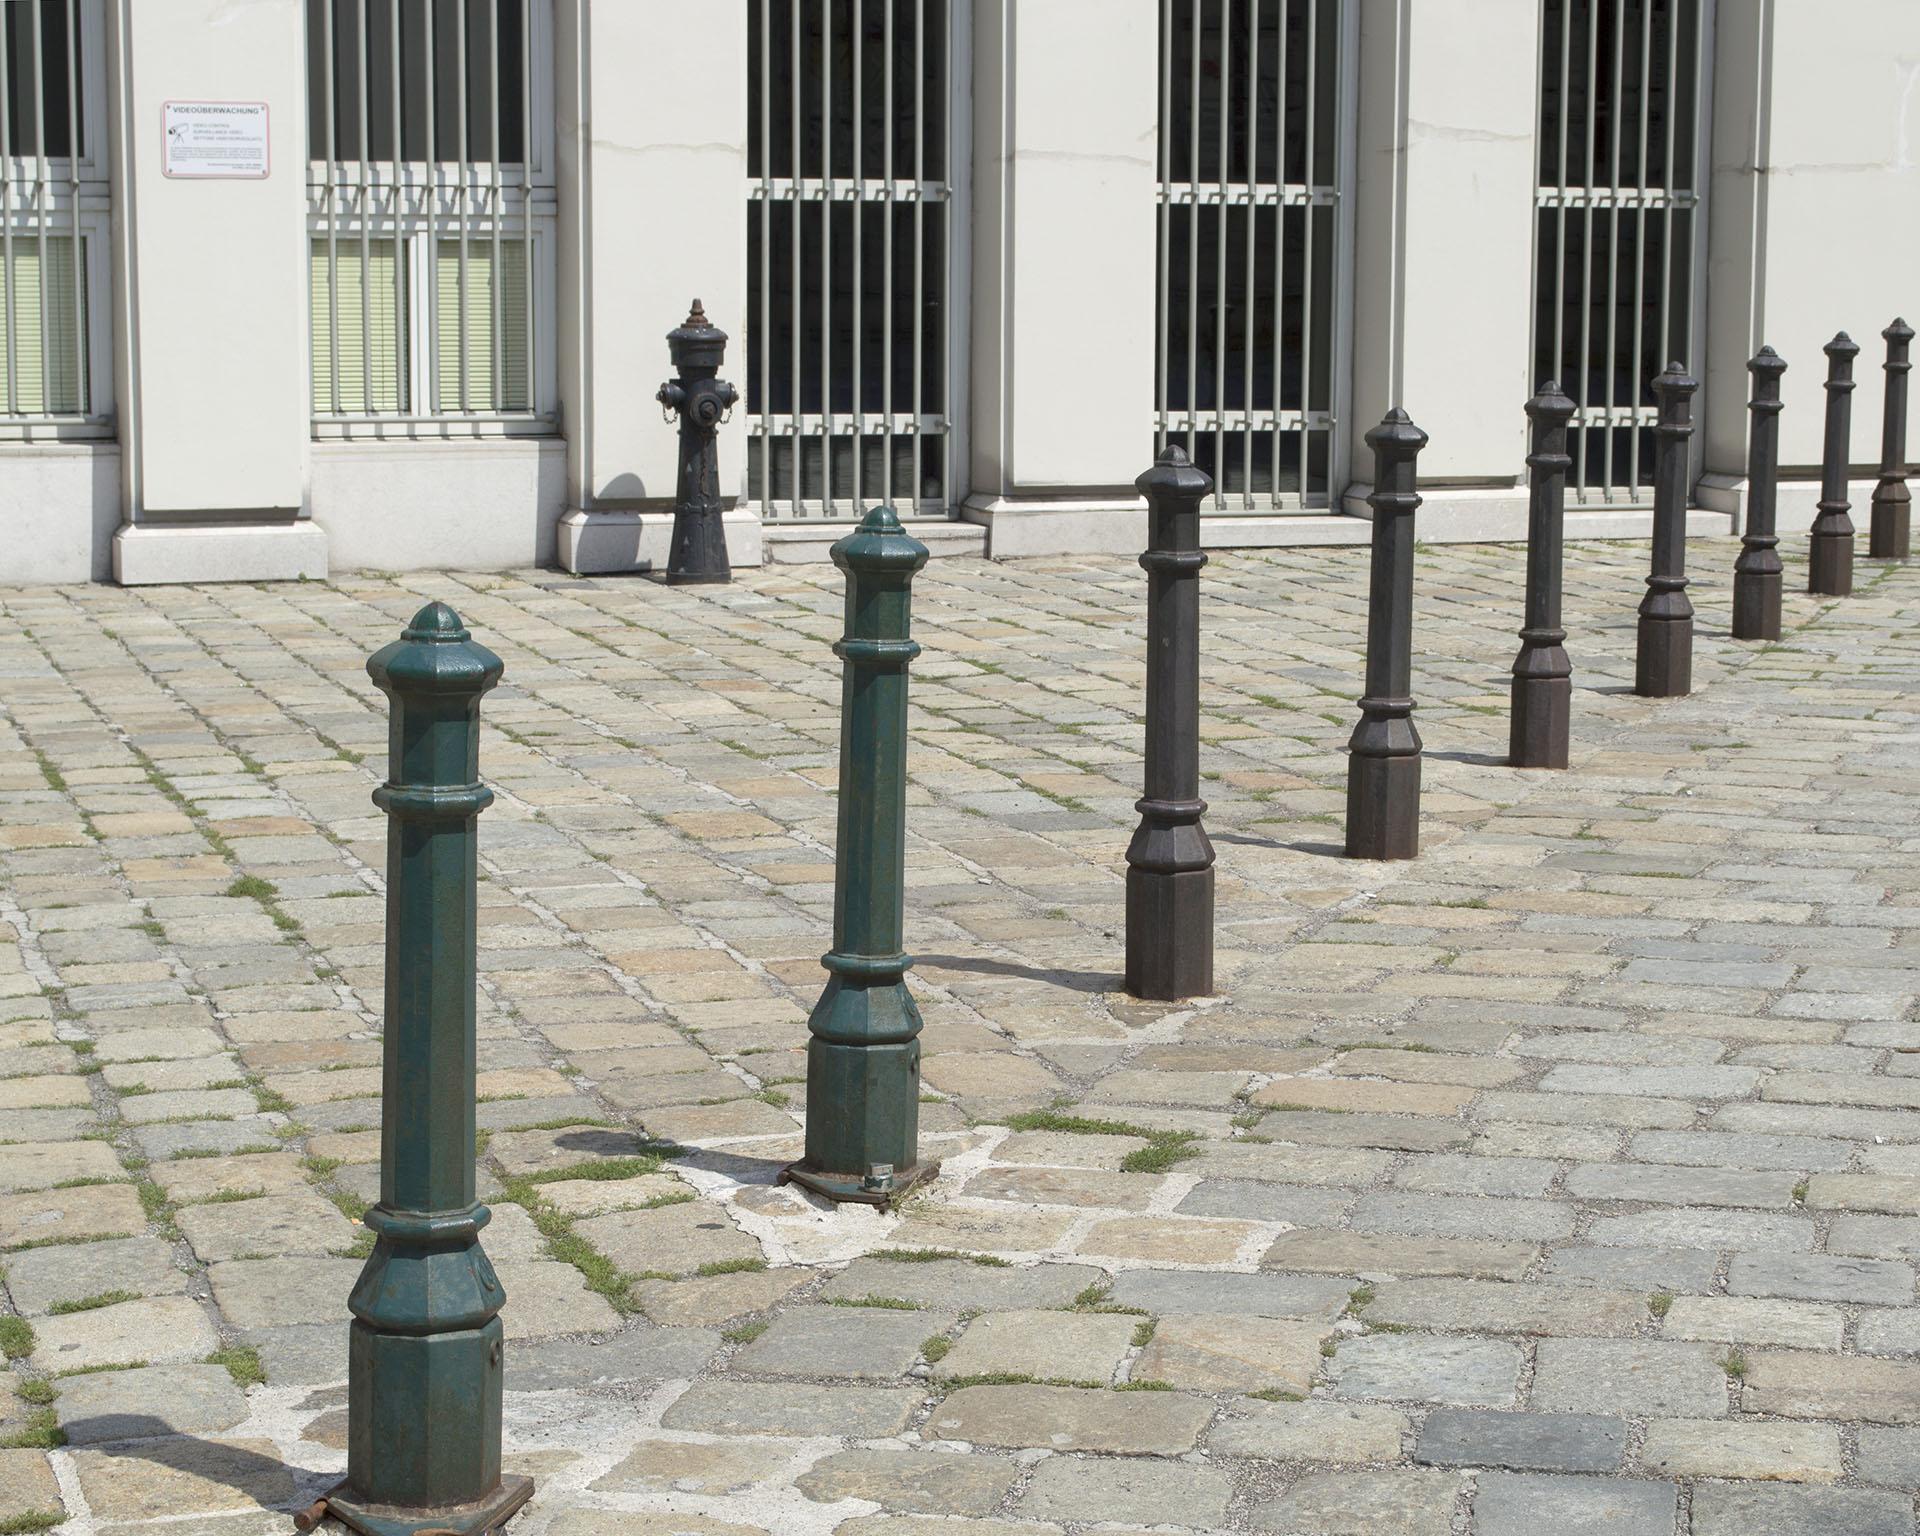 Hydrant and Bollards, Vienna, Austria